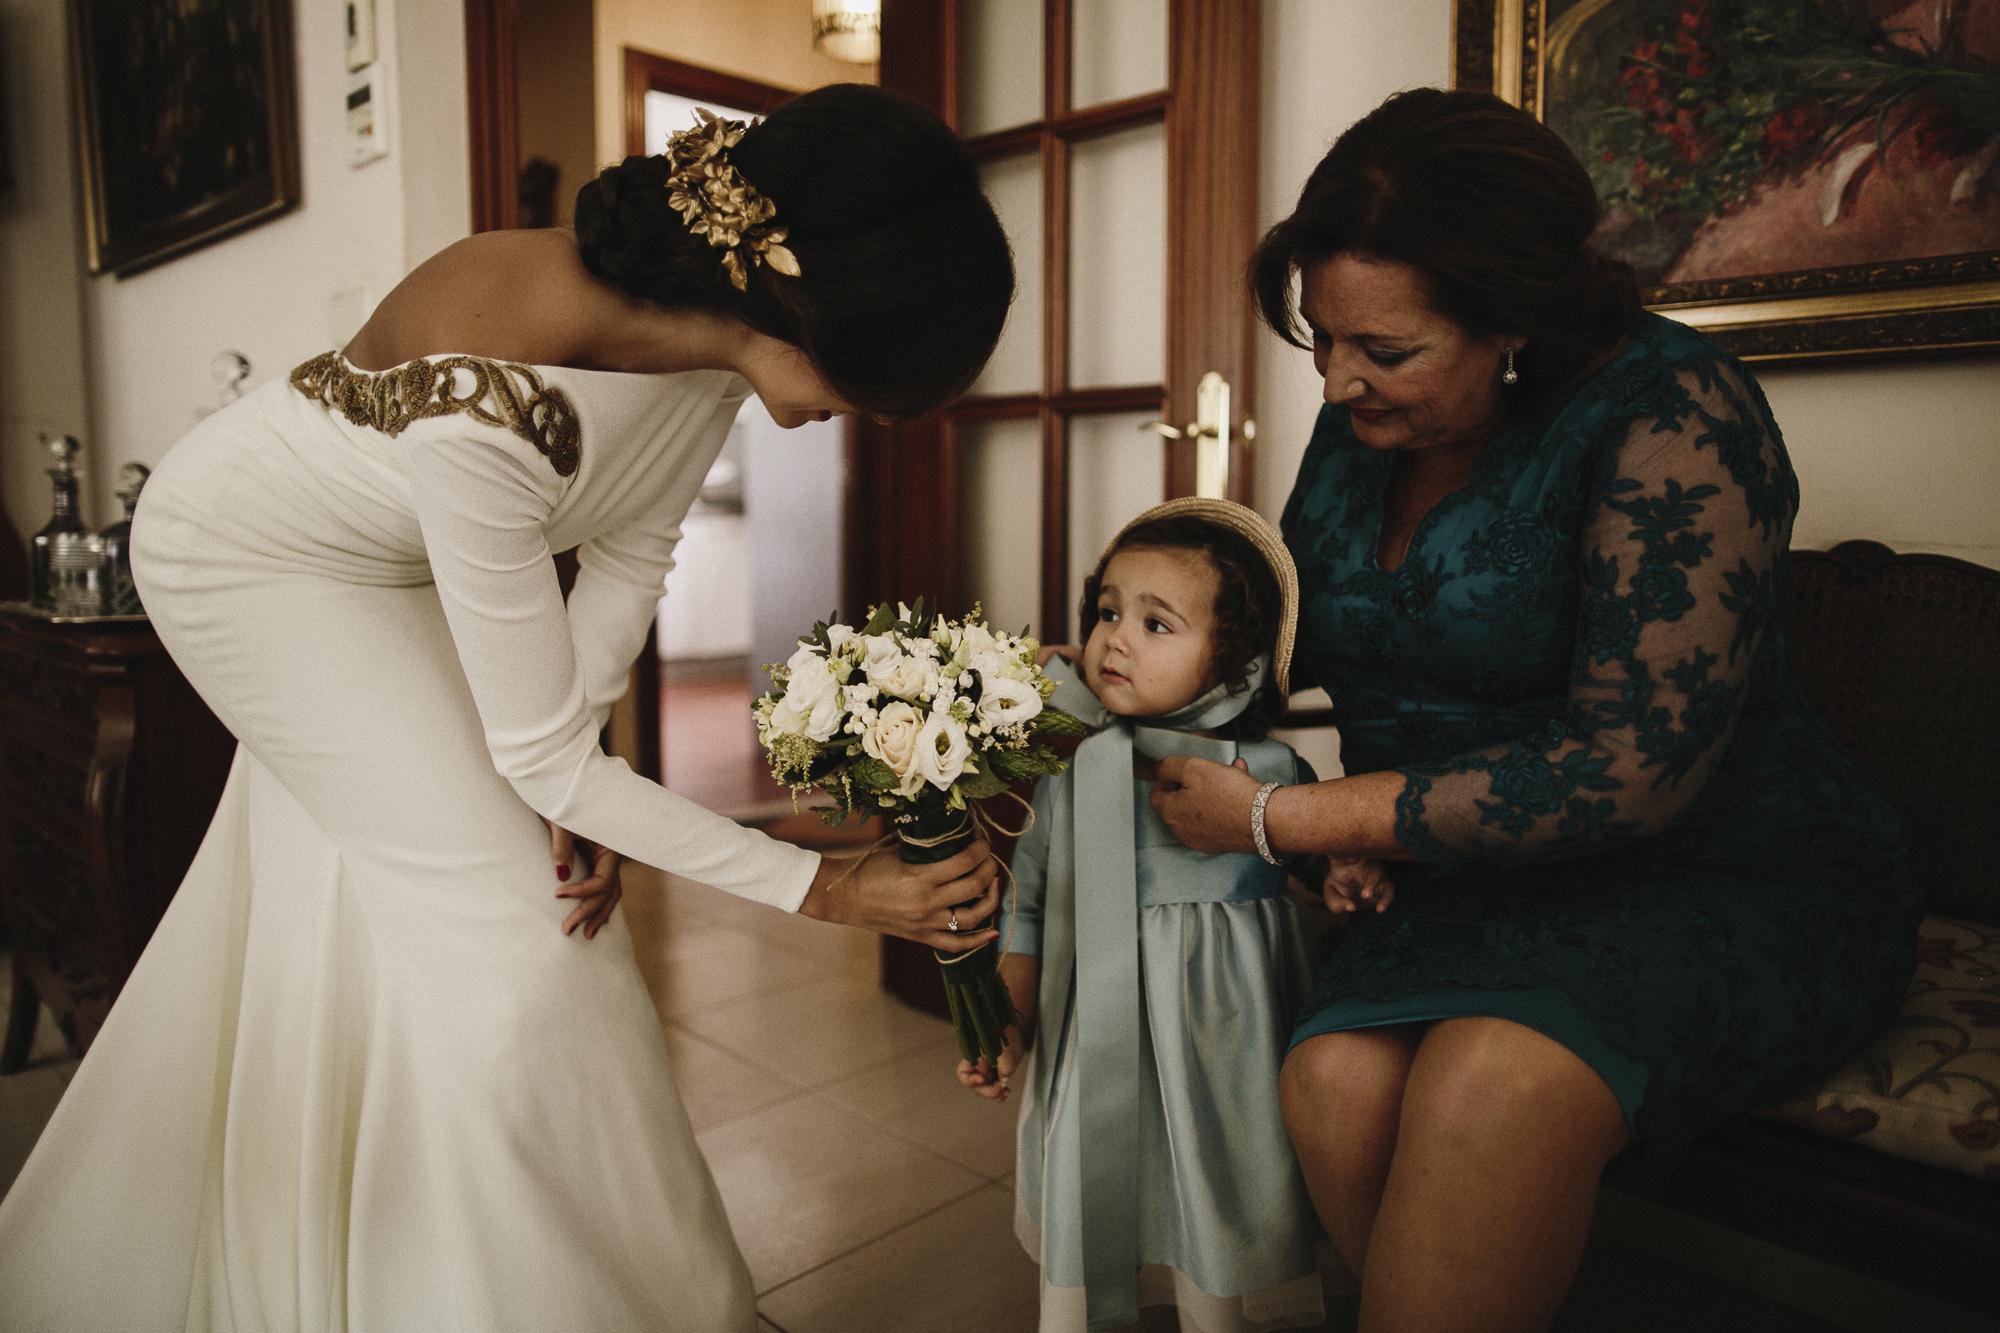 alfonso_flores_destination_wedding_photogrpaher_españa-33.jpg